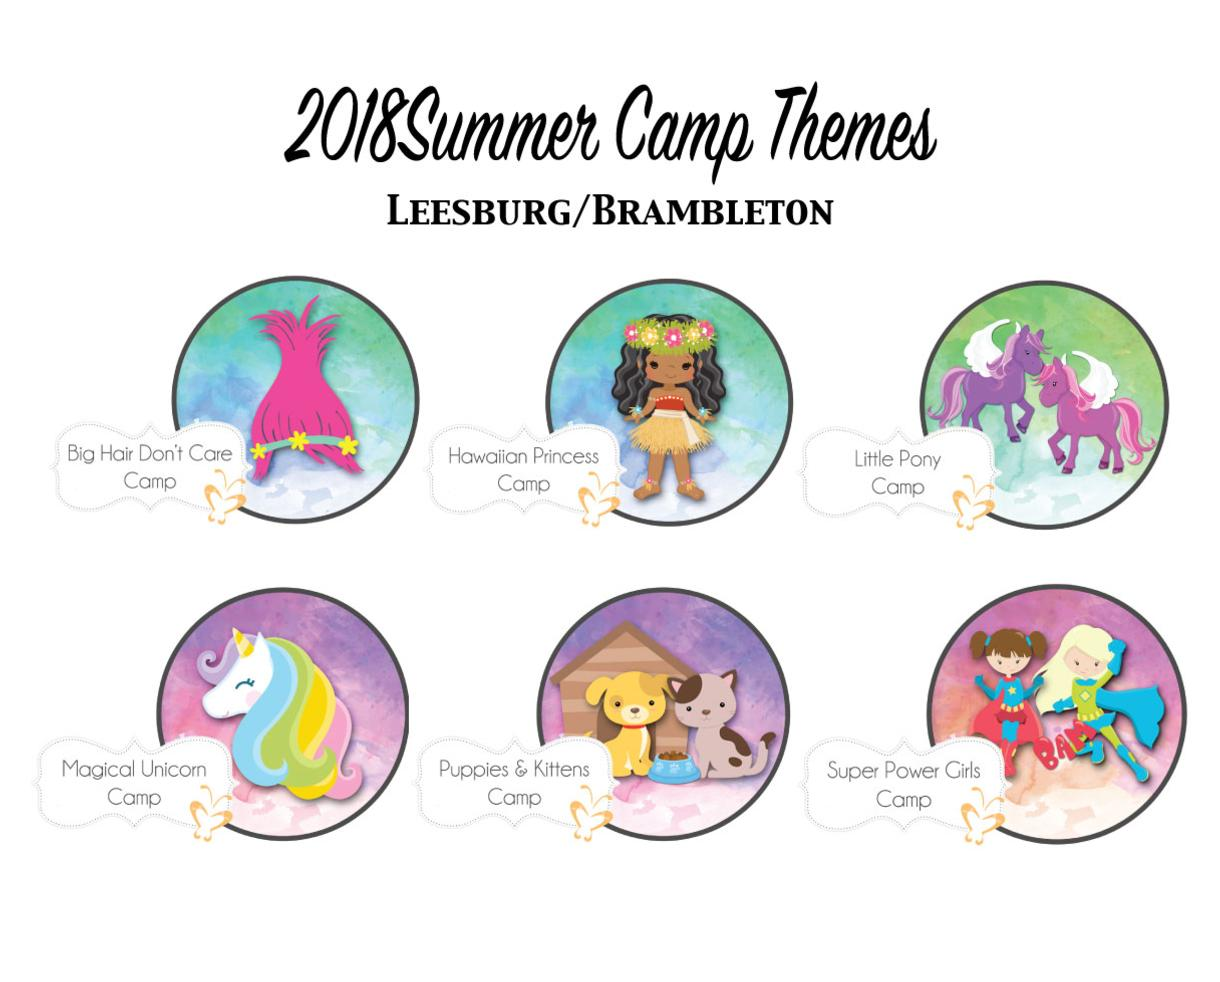 Bella Ballerina Camp - Brambleton or Leesburg